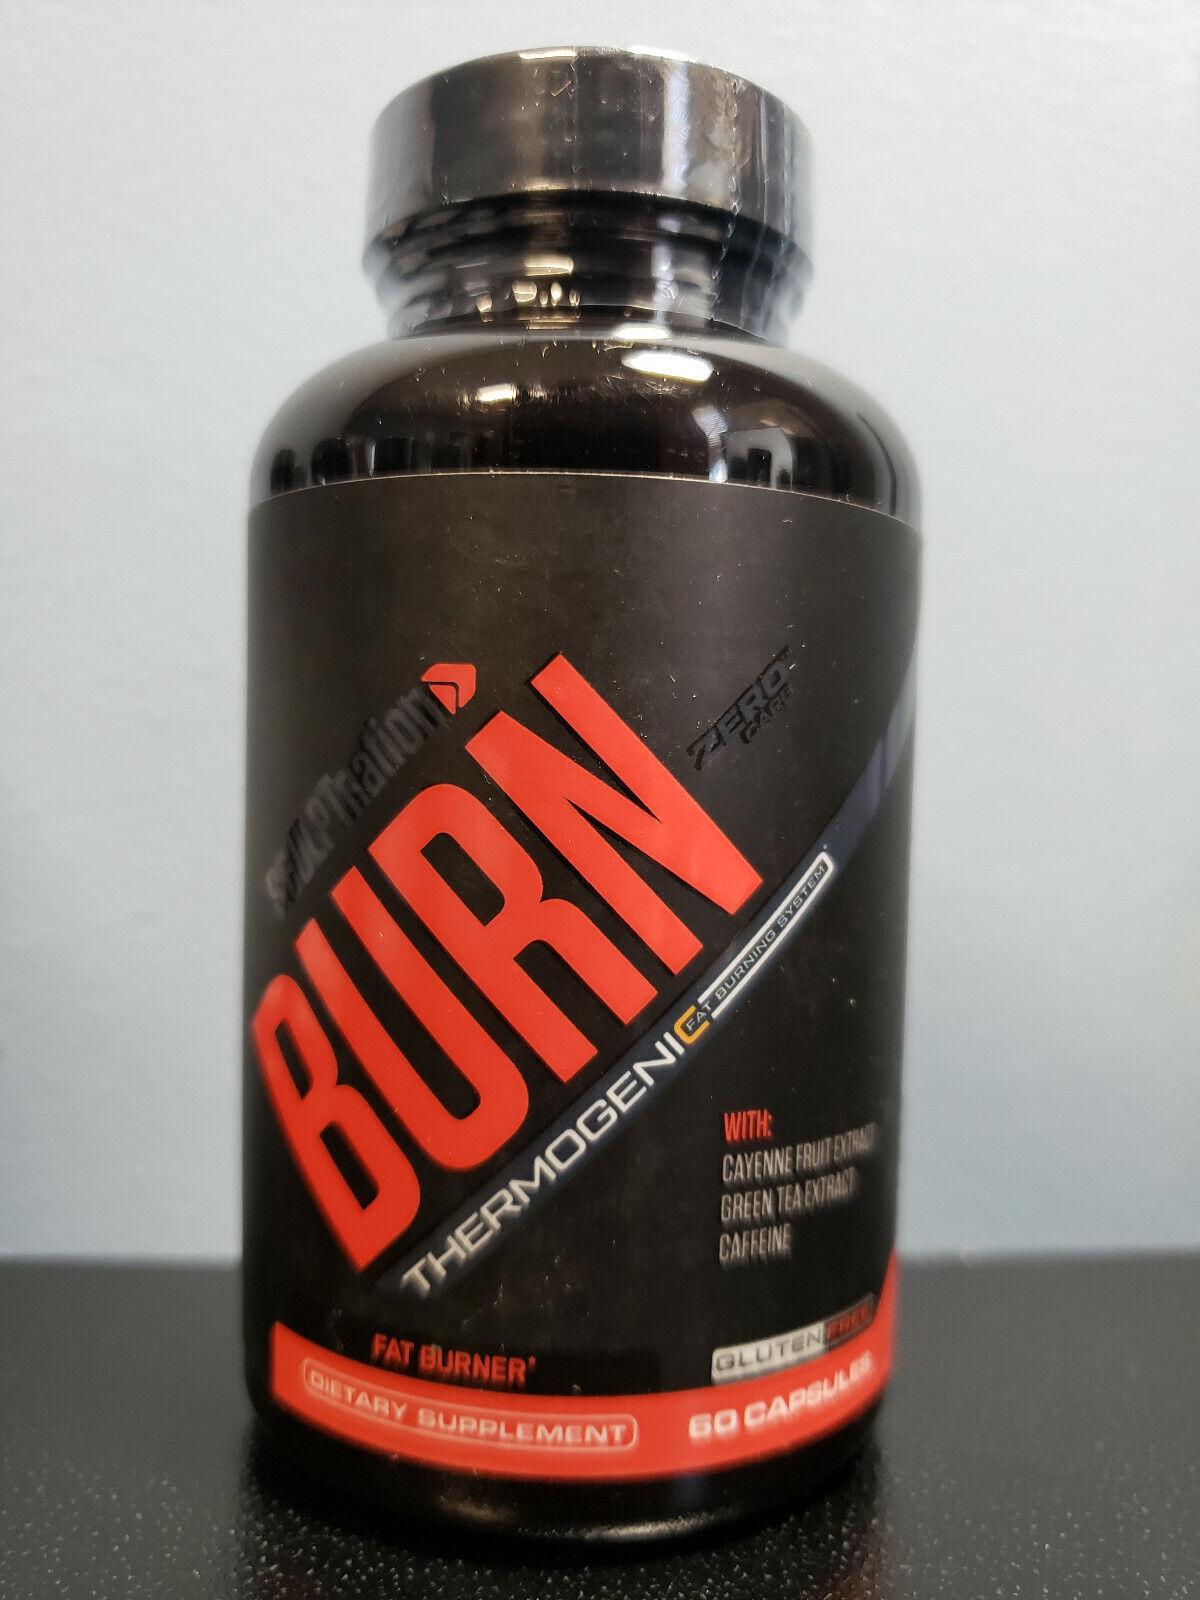 SCULPTnation Burn Thermogenic Fat Burner 60 Capsules - New / Sealed! Exp 9/2021